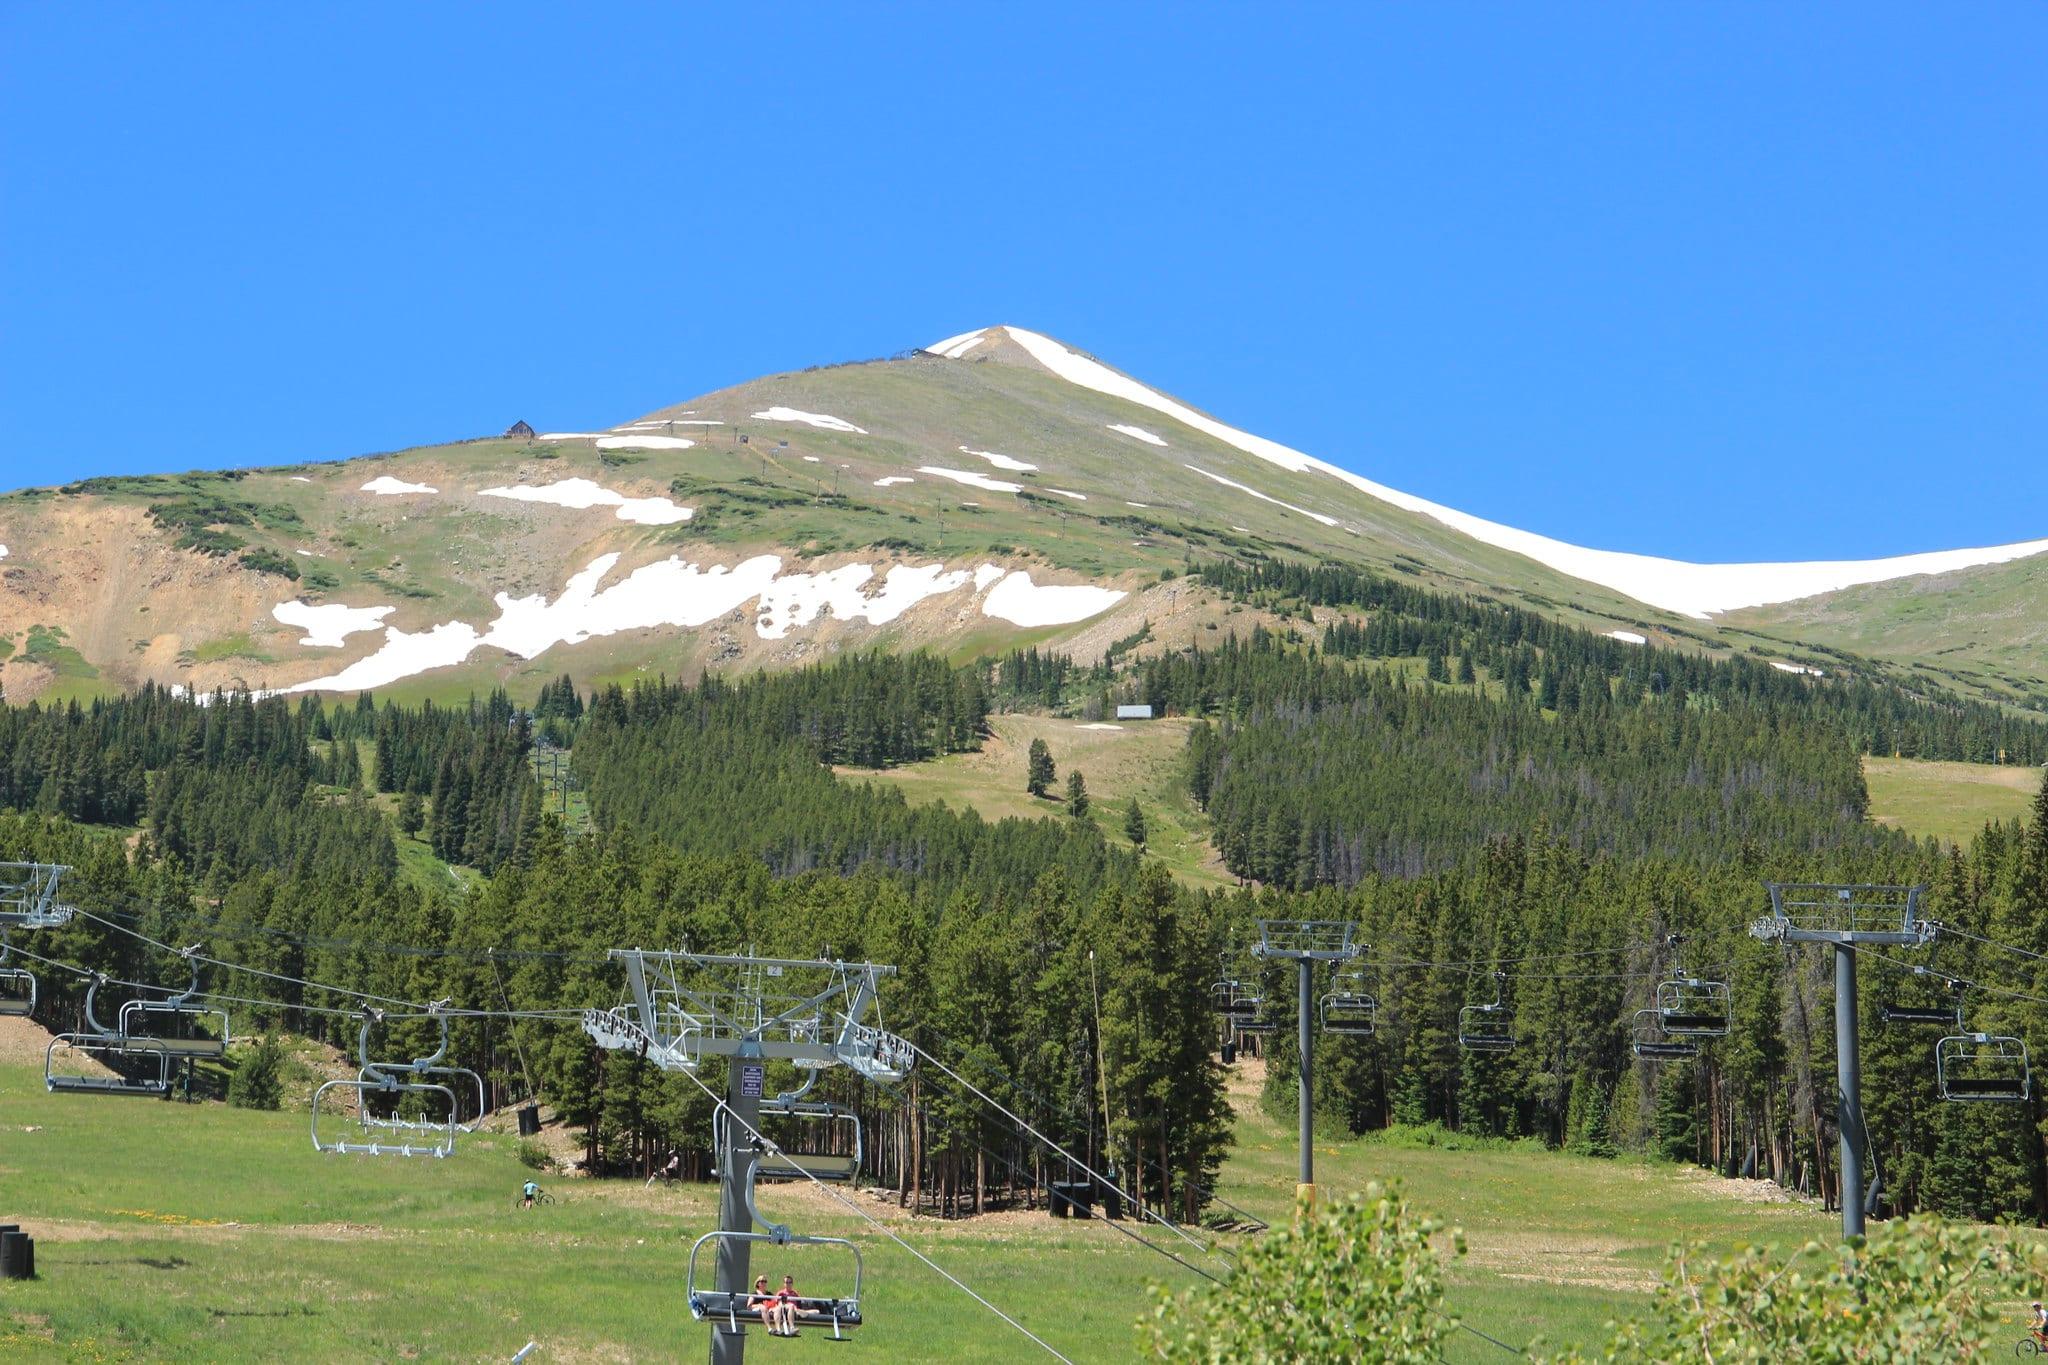 peak 8 summit breckenridge